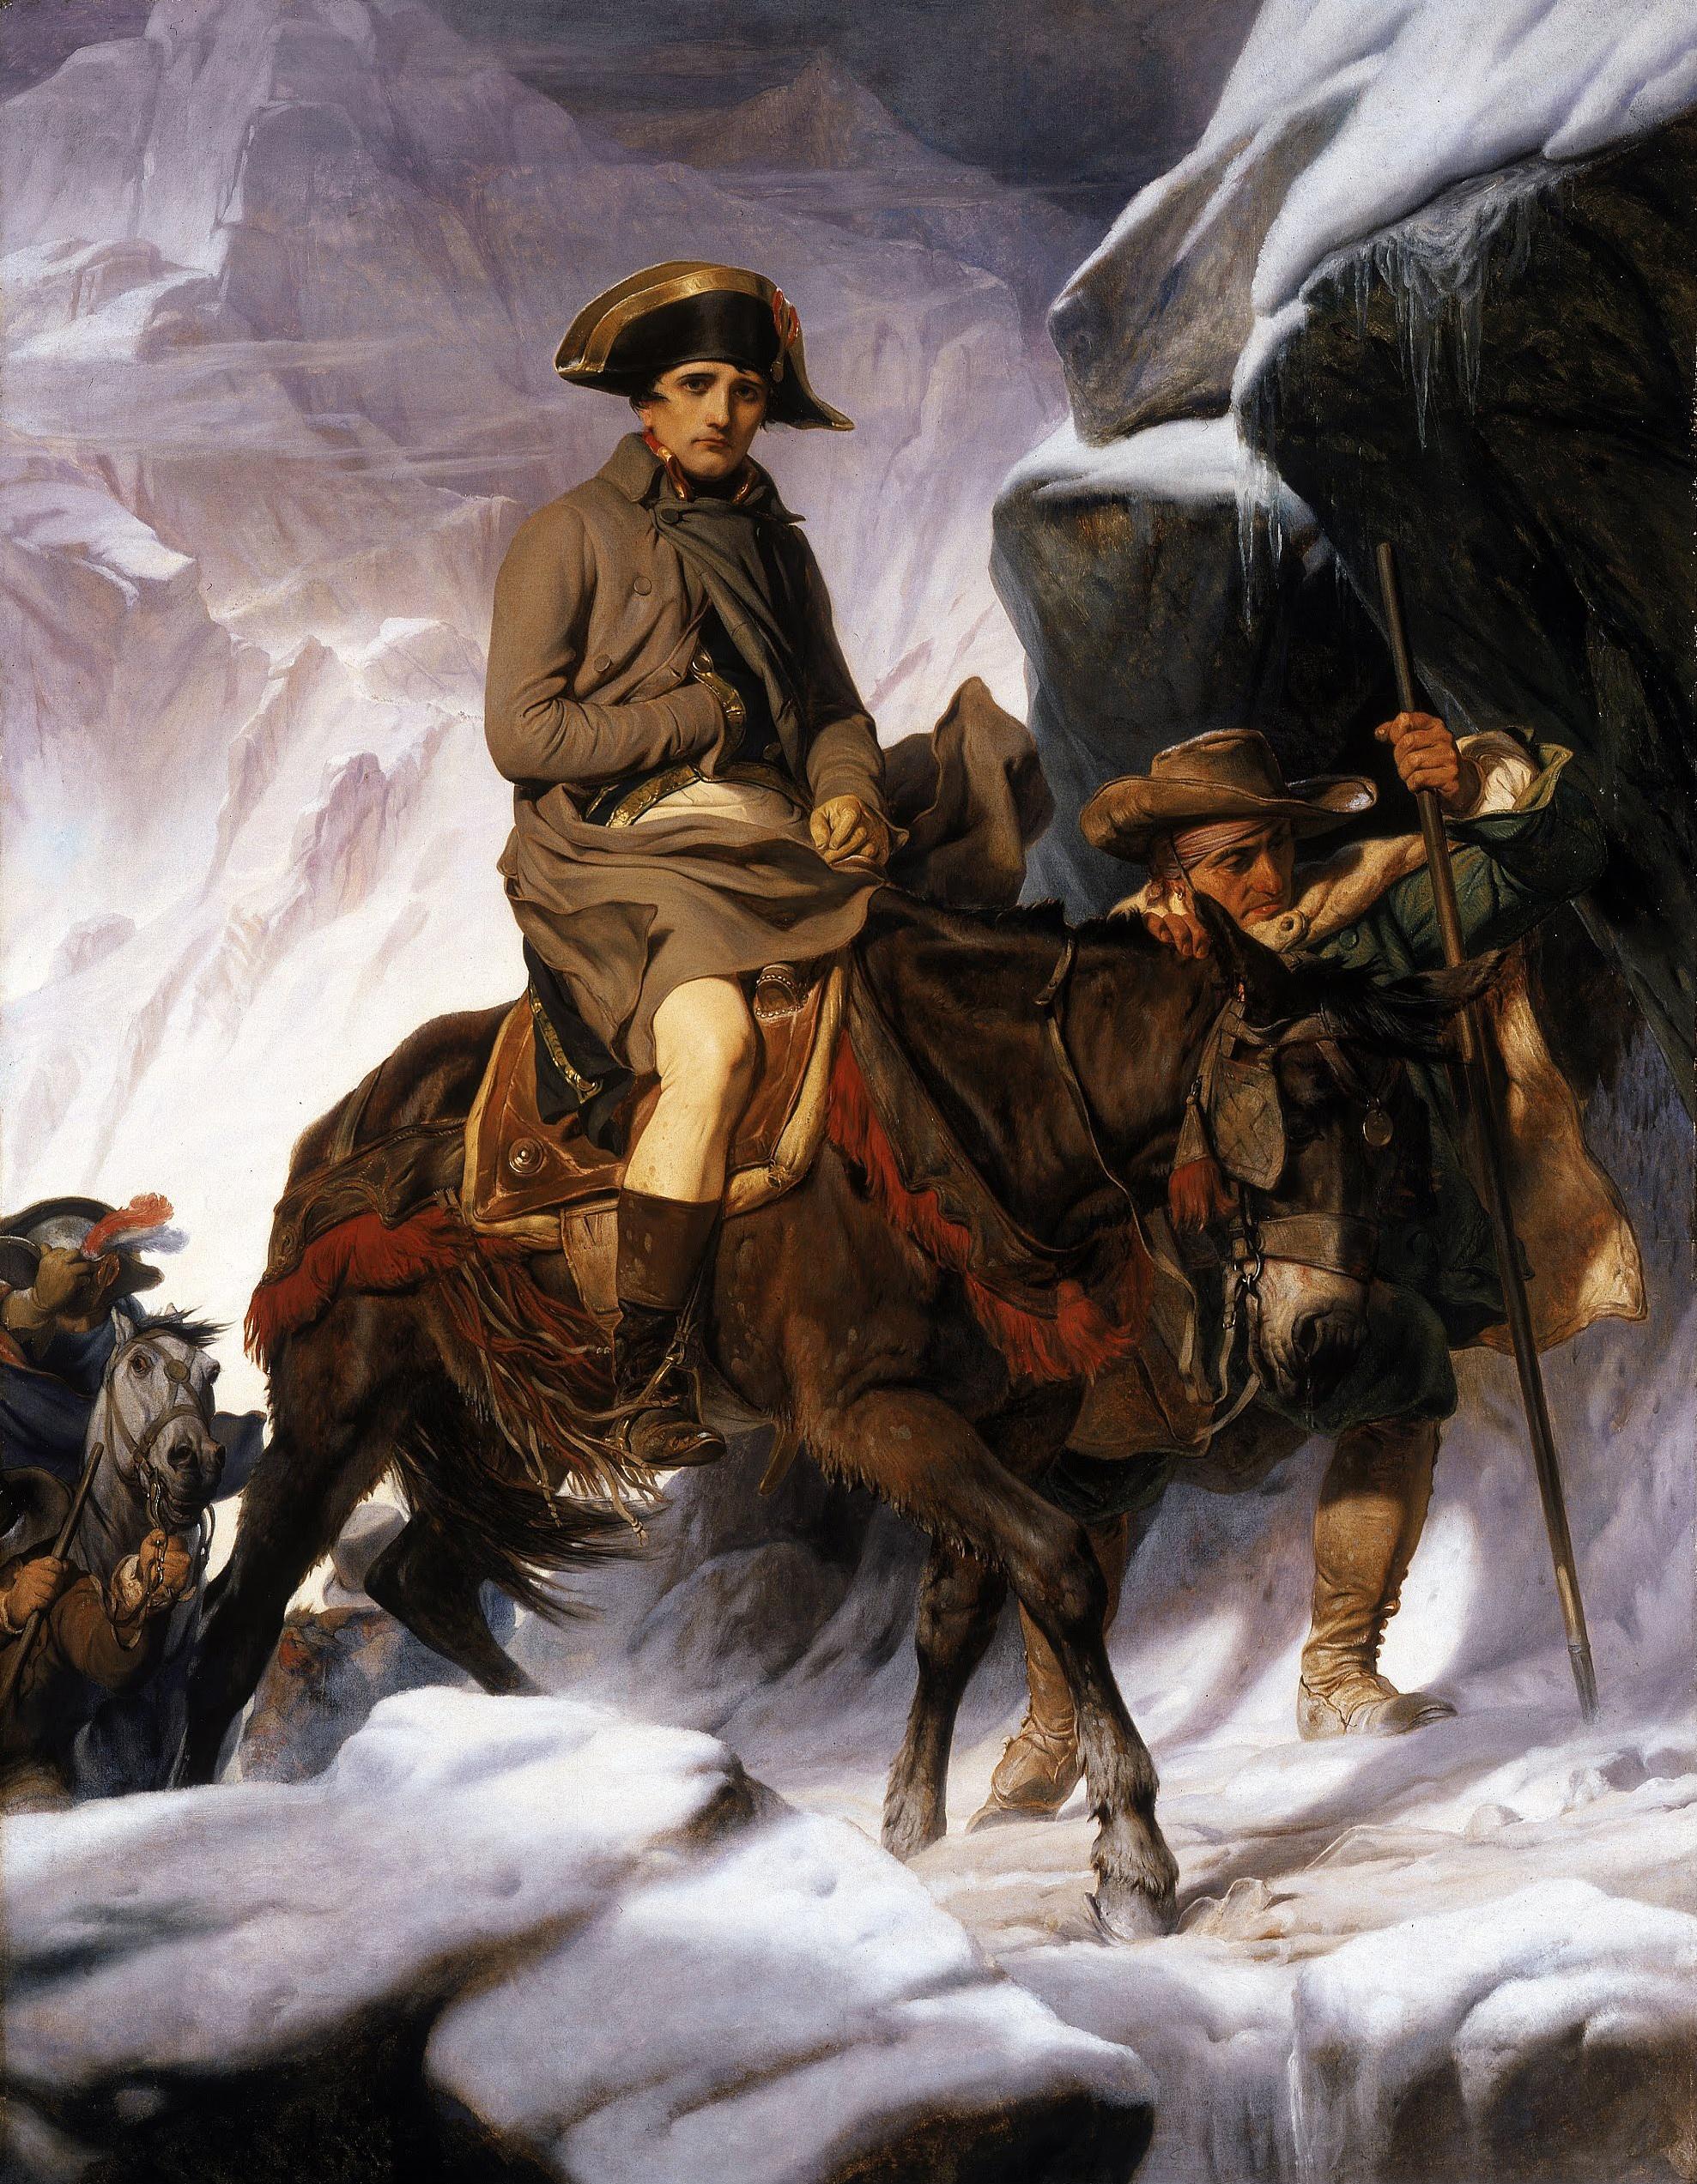 Bonaparte Crossing the Alps, realist version by Paul Delaroche in 1848